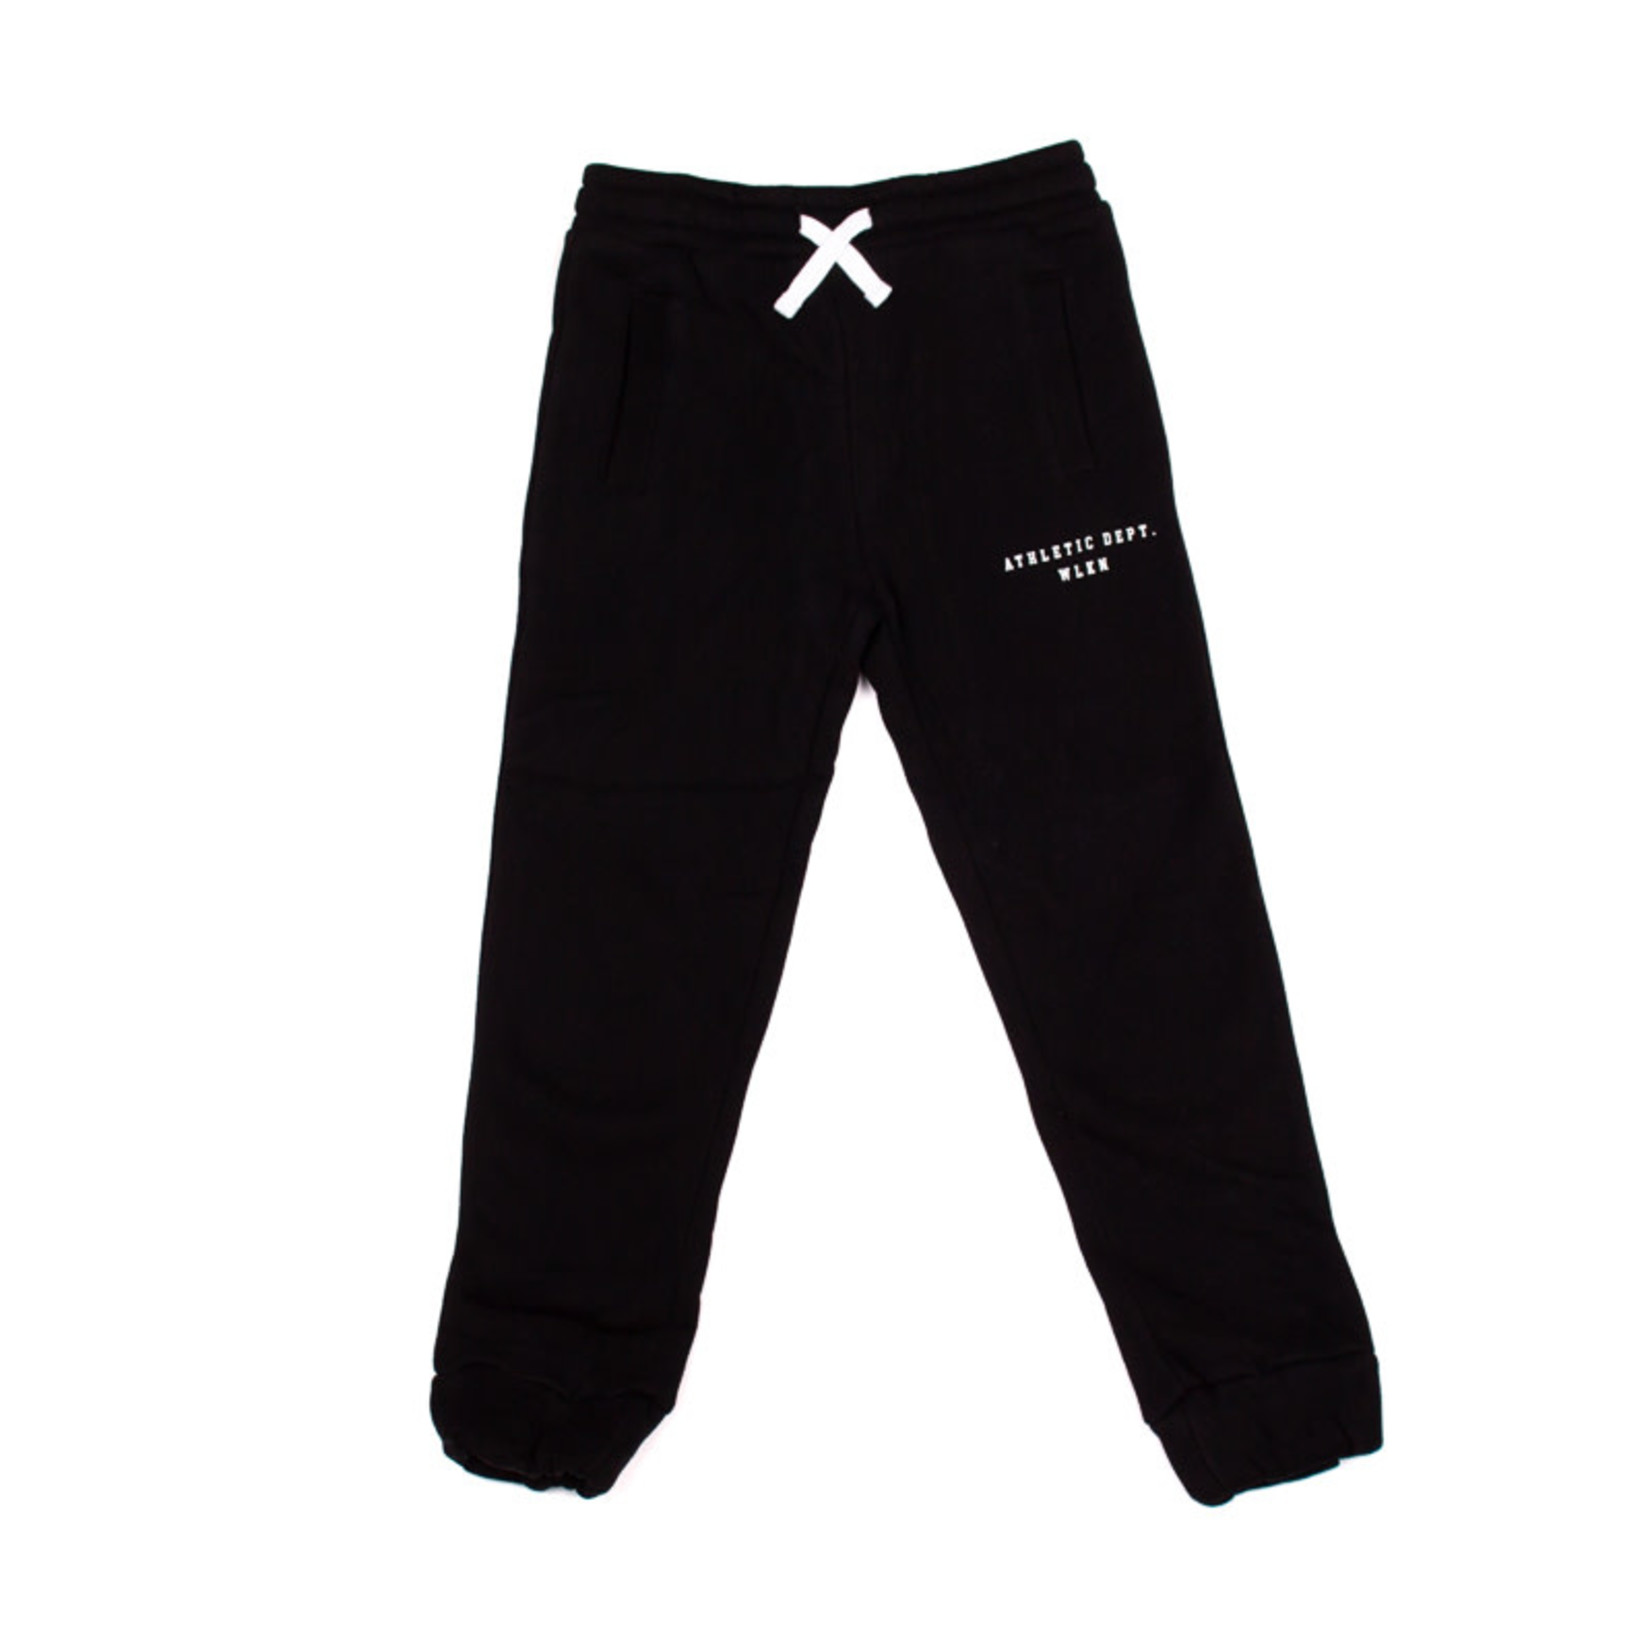 WLKN WLKN : Junior Athletic Sweatpants